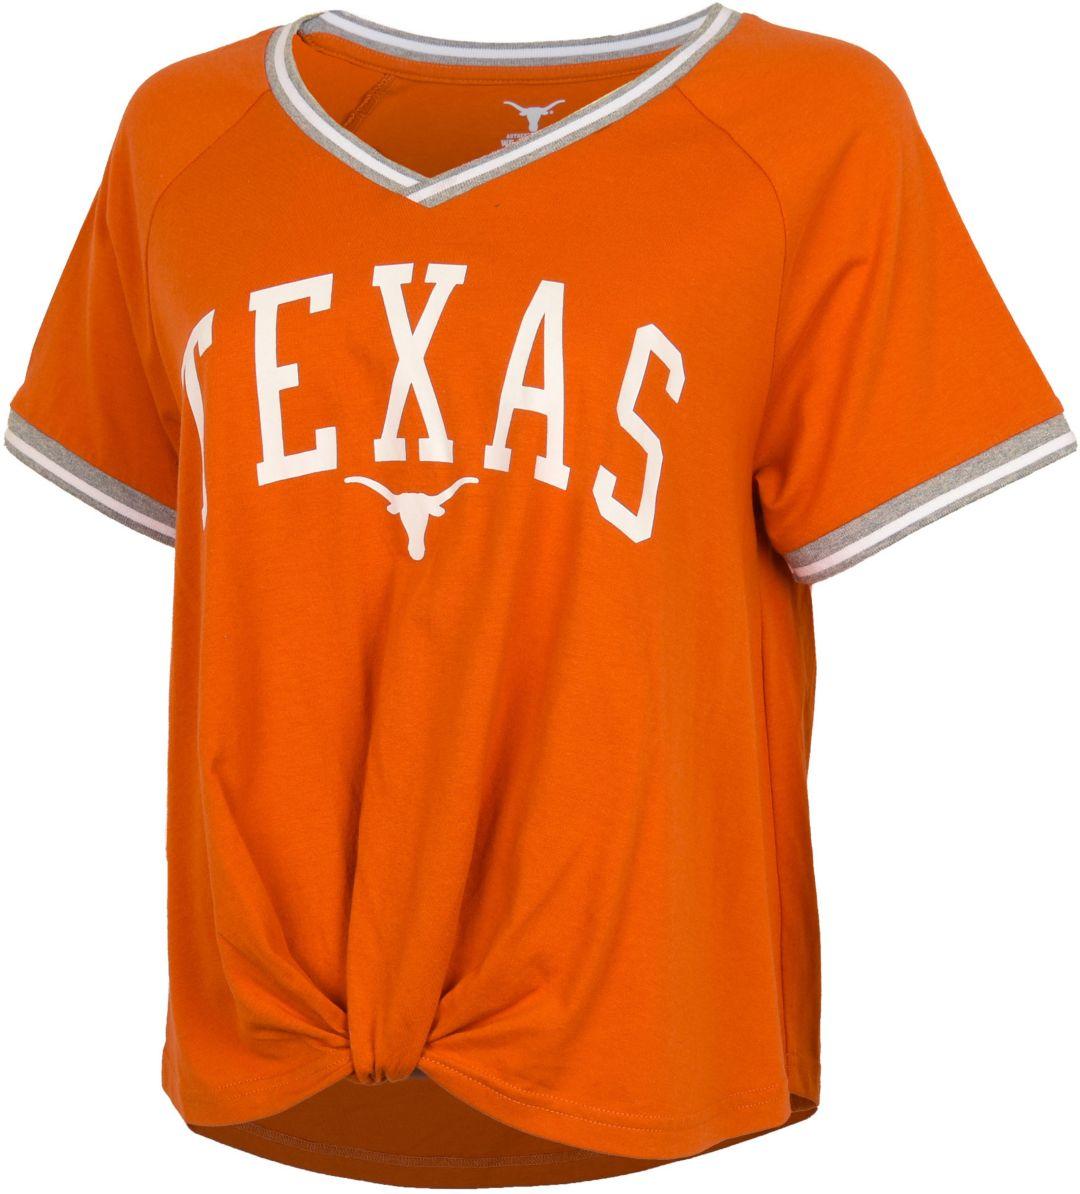 ad94f788 University of Texas Authentic Apparel Women's Texas Longhorns Burnt Orange  Channing V-Neck T-Shirt